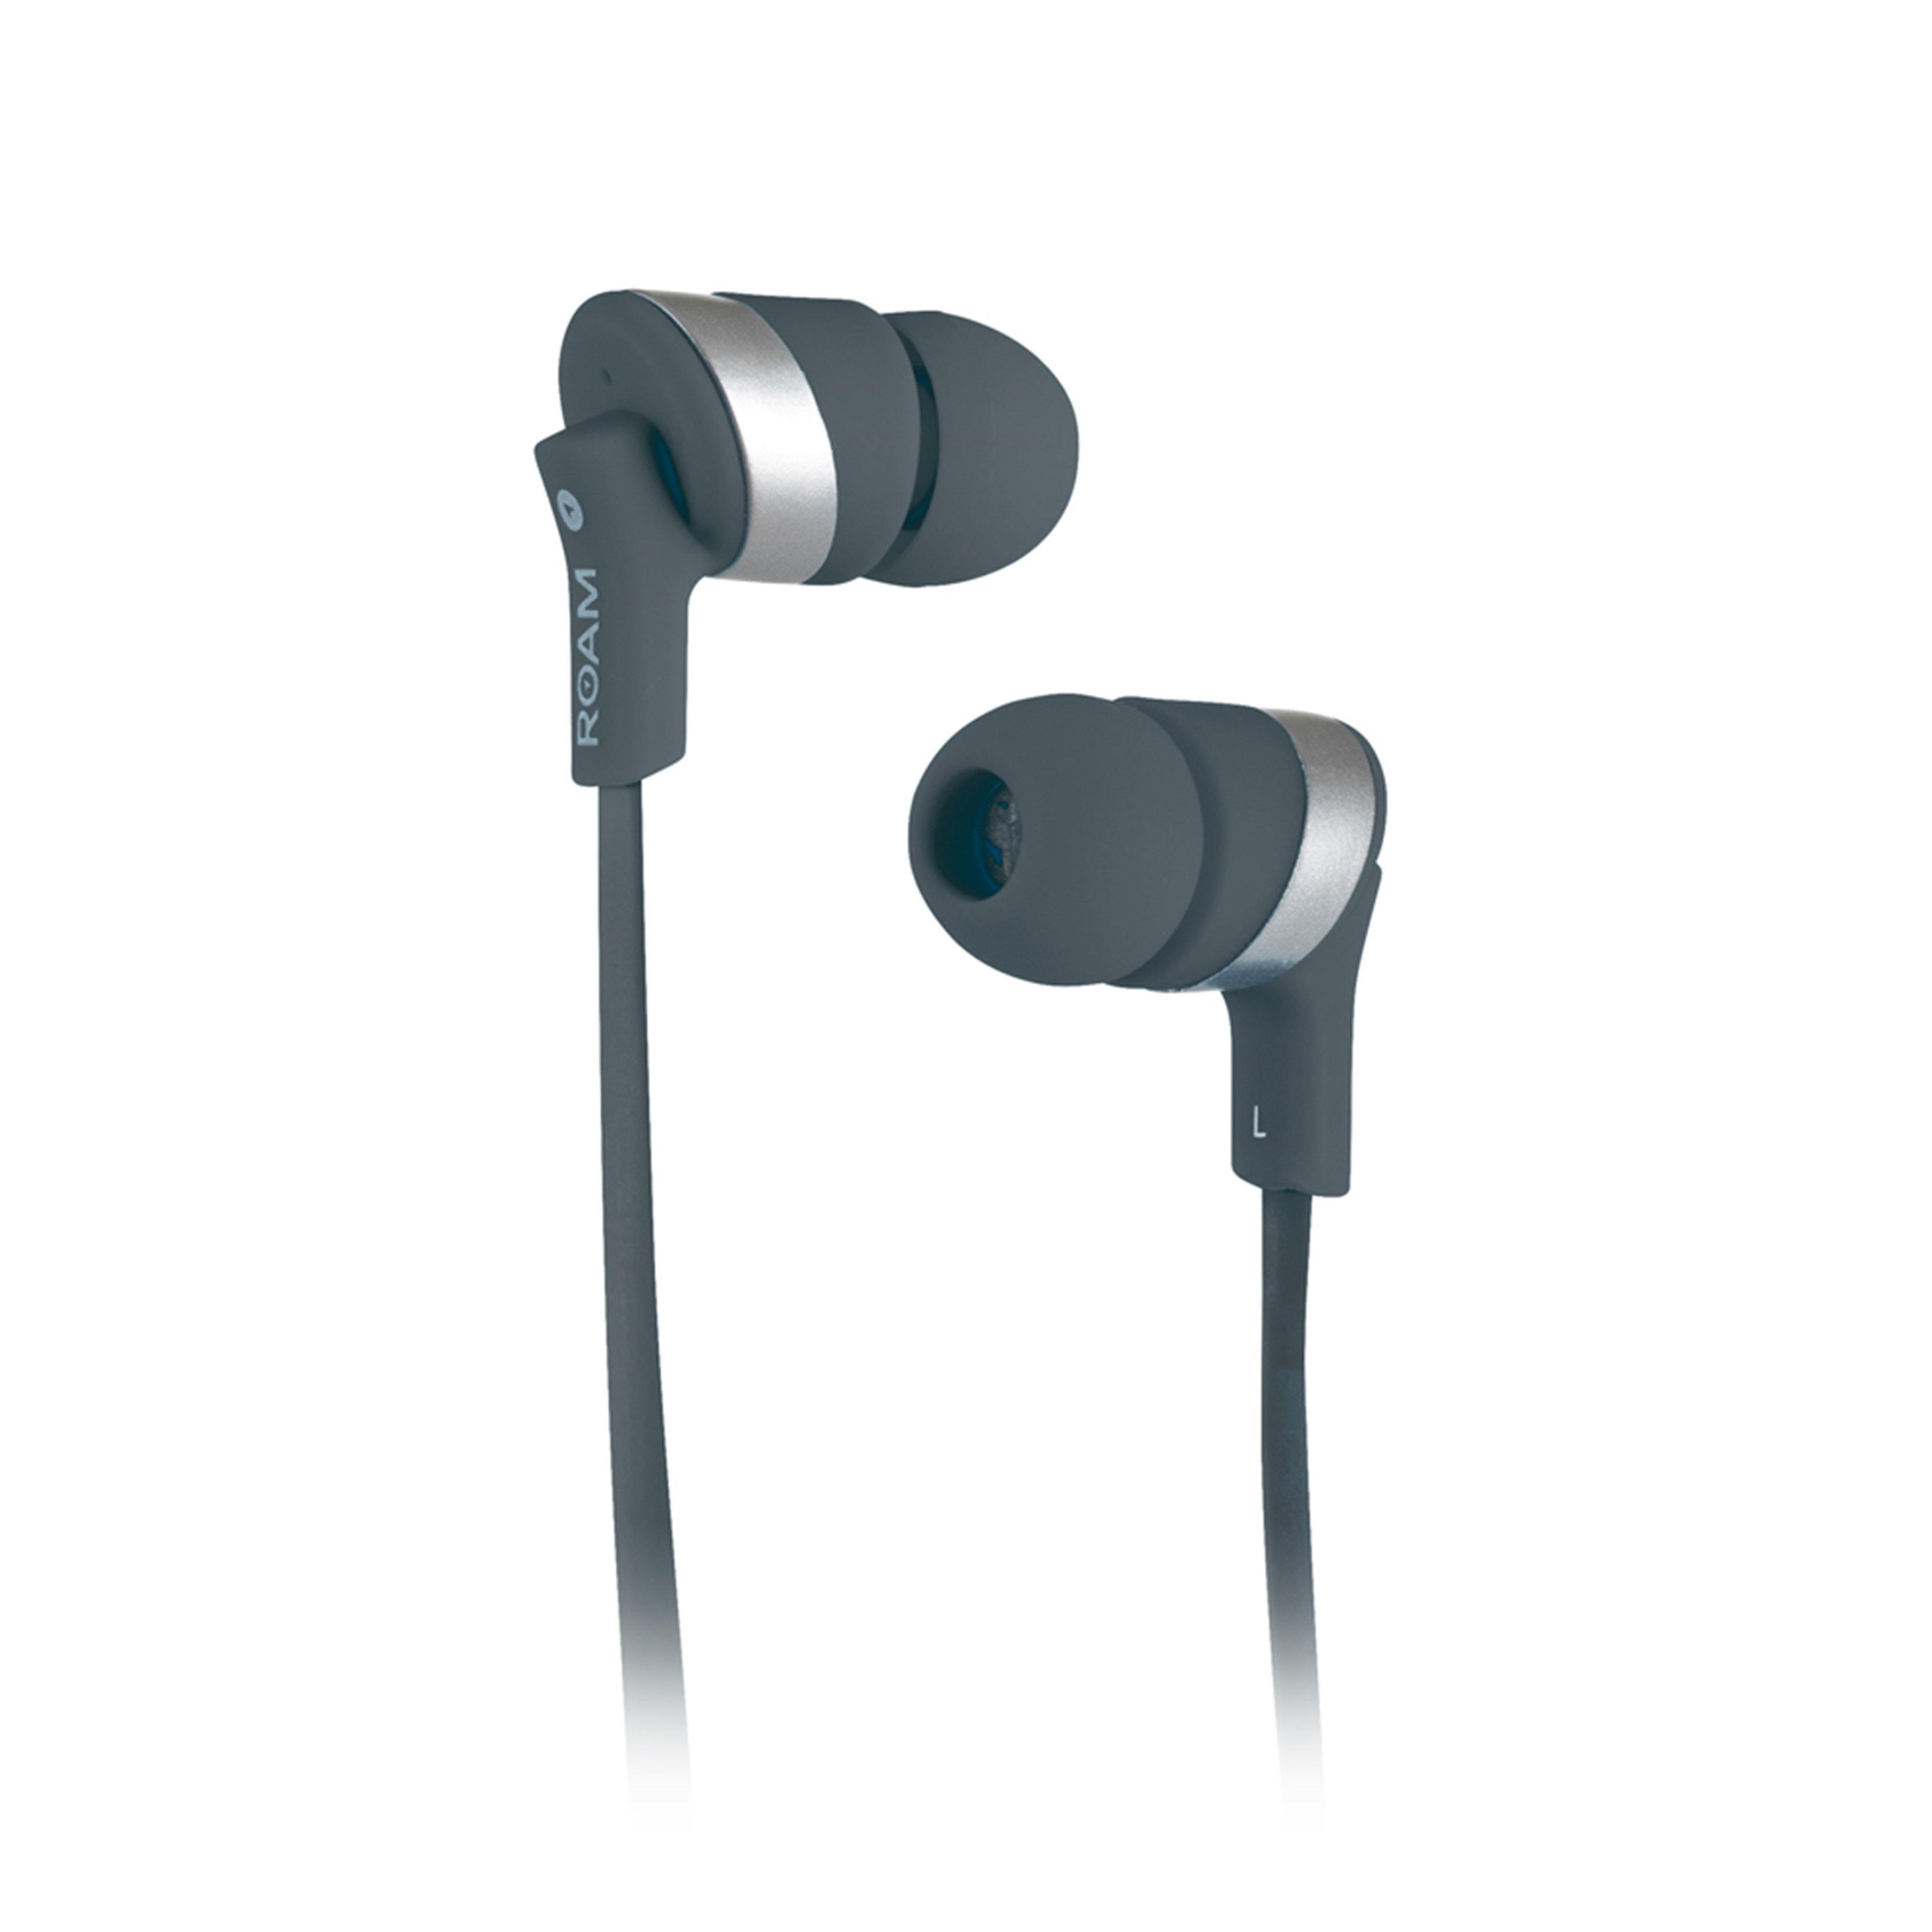 Roam Colours Black Bluetooth Earphones (hmv Exclusive) - 1